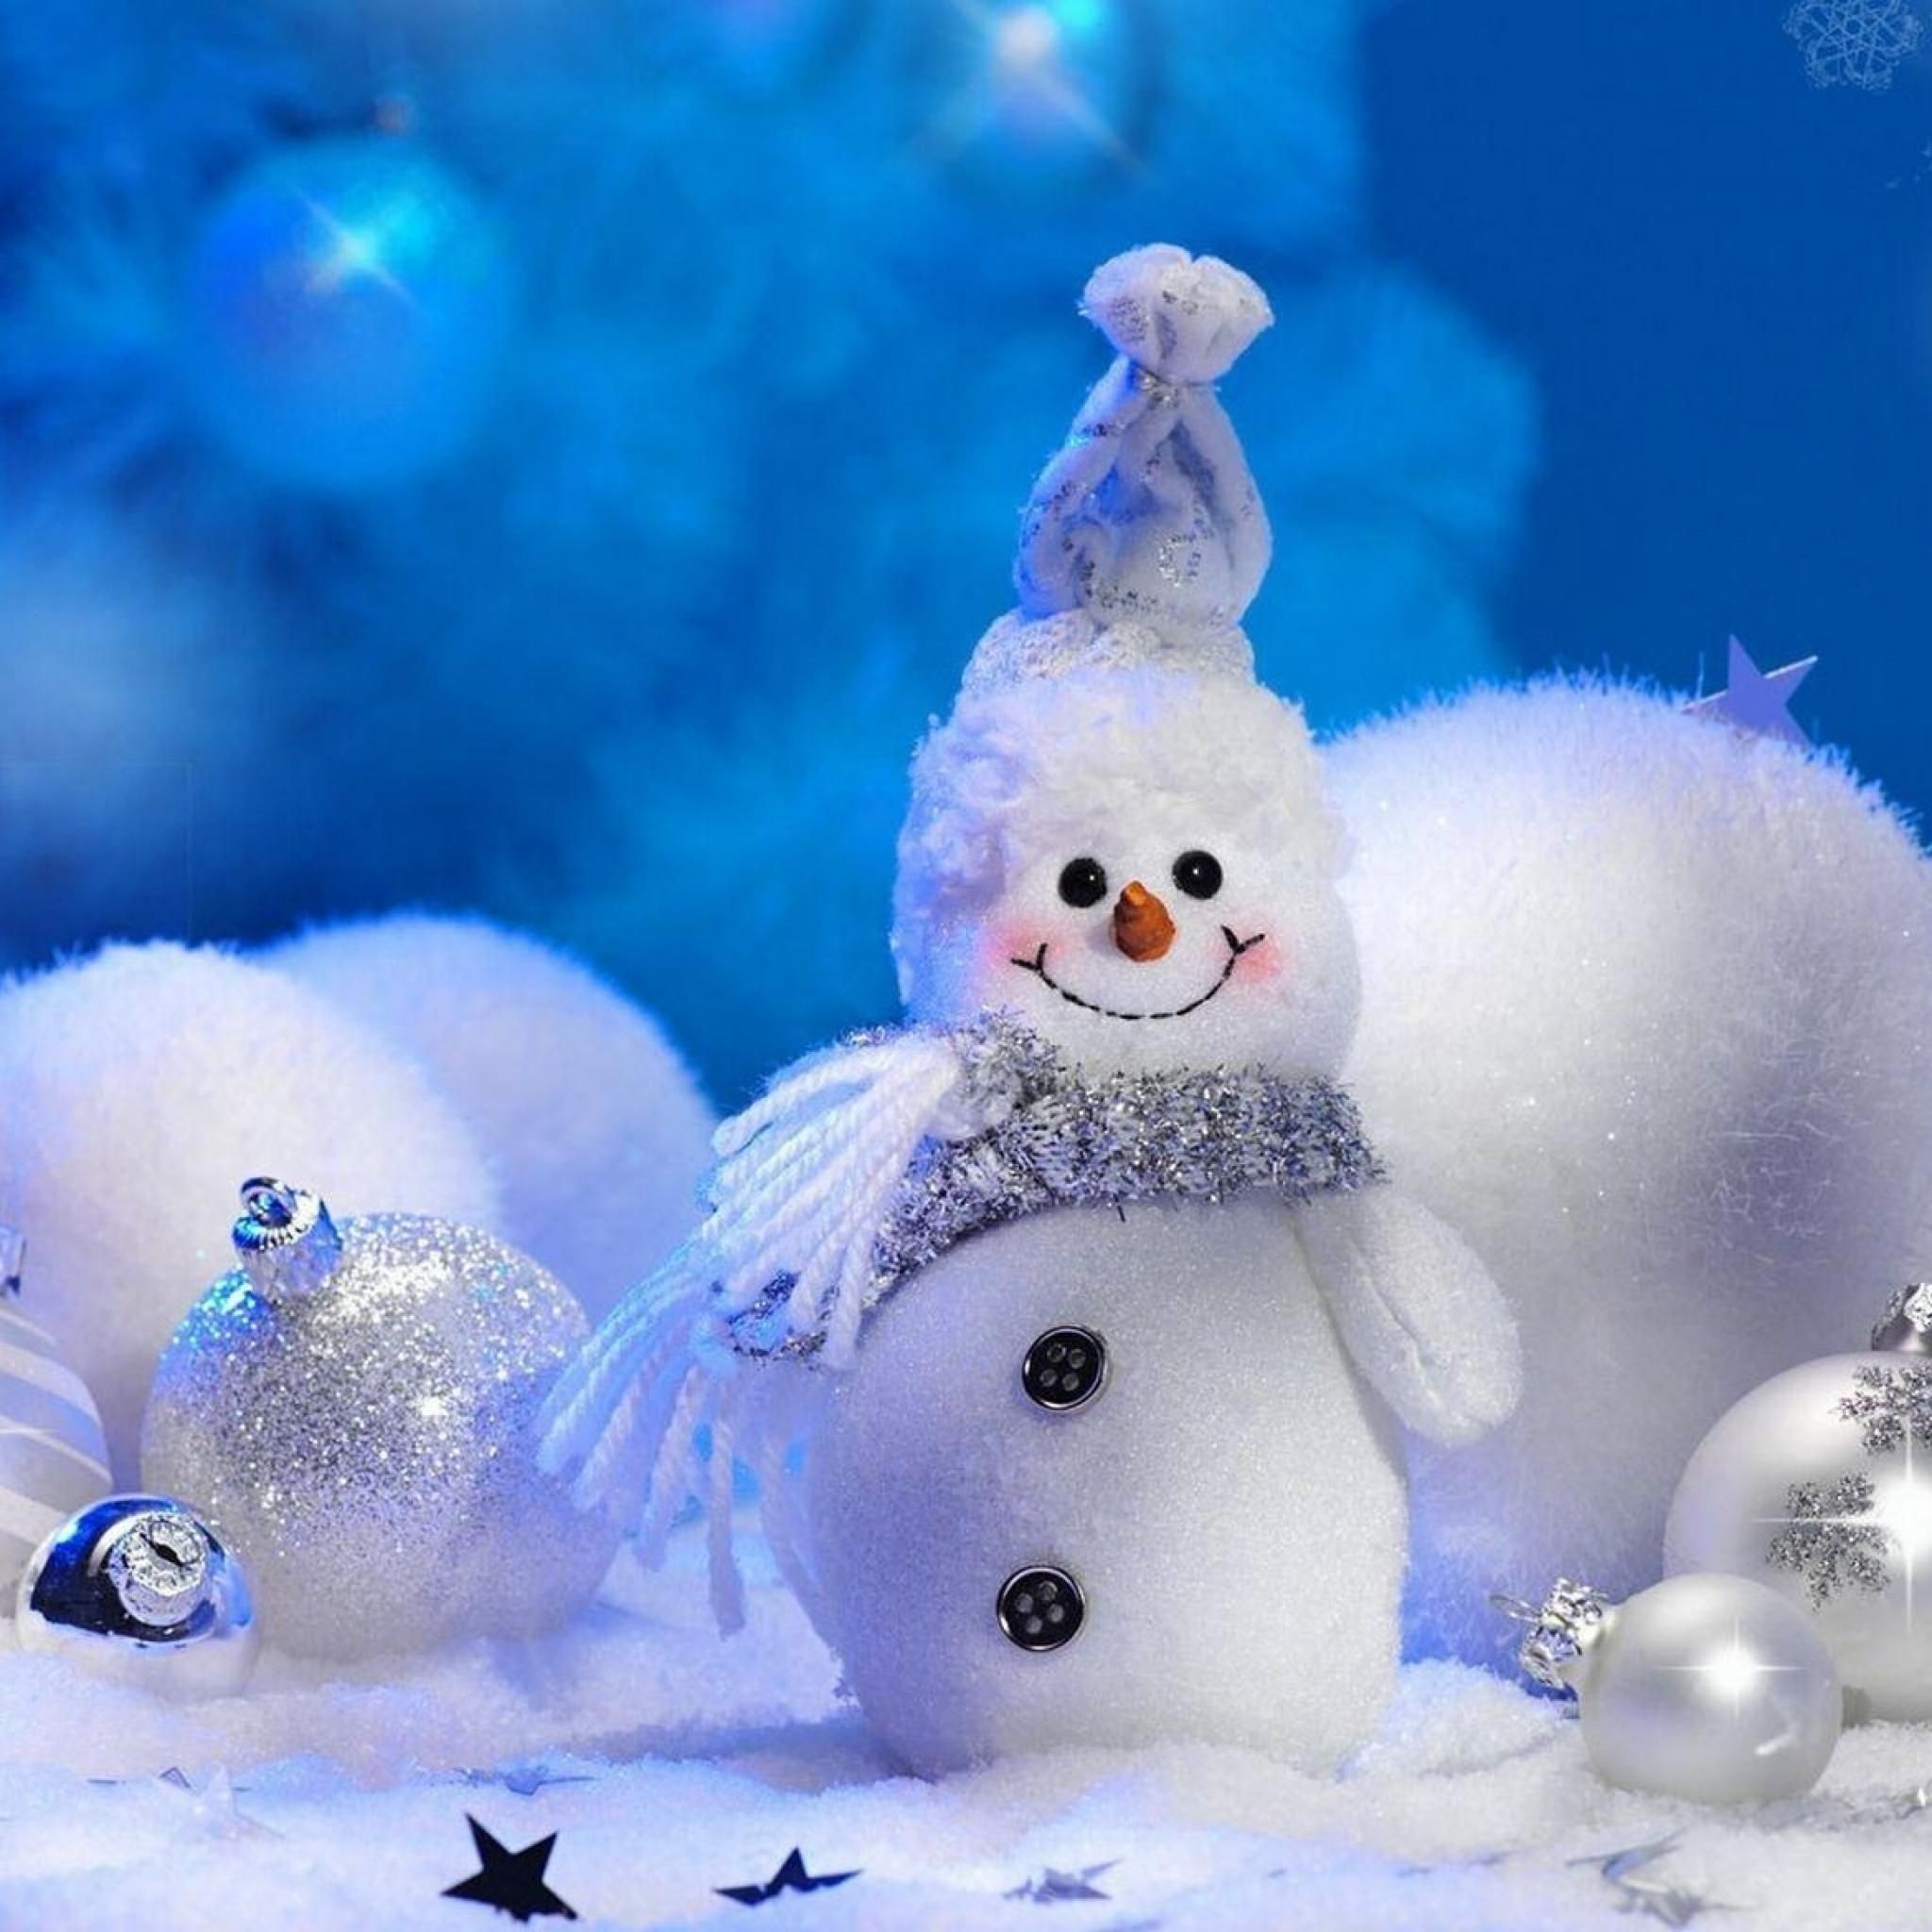 snowman Stunning iPad Retina Snowman Wallpapers The